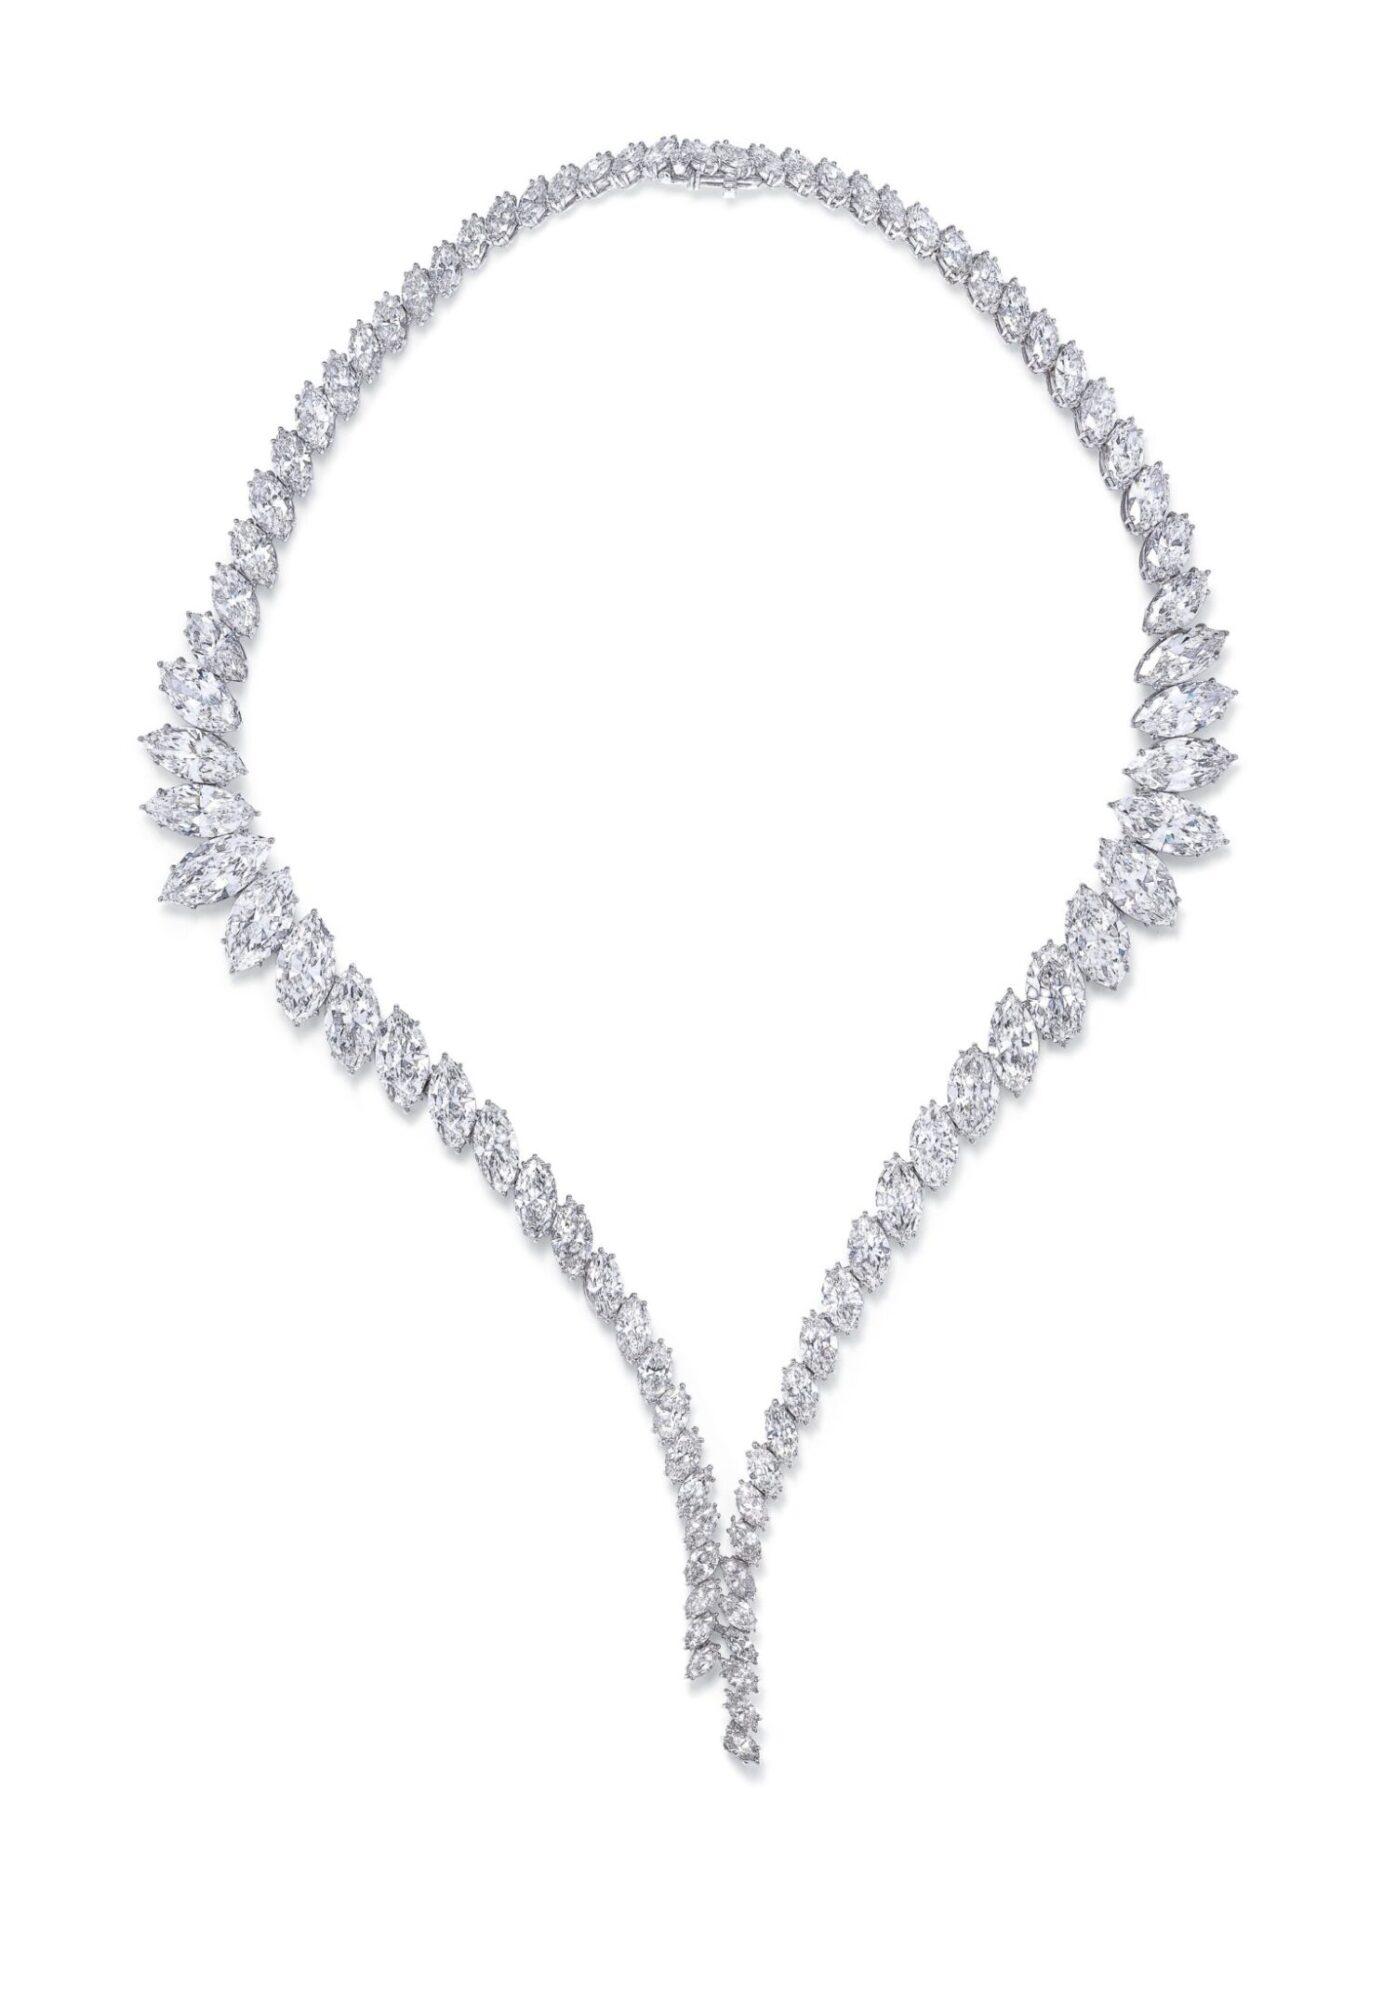 Diamond necklace by Harry Winston, estiamte CHF400,000-600,000